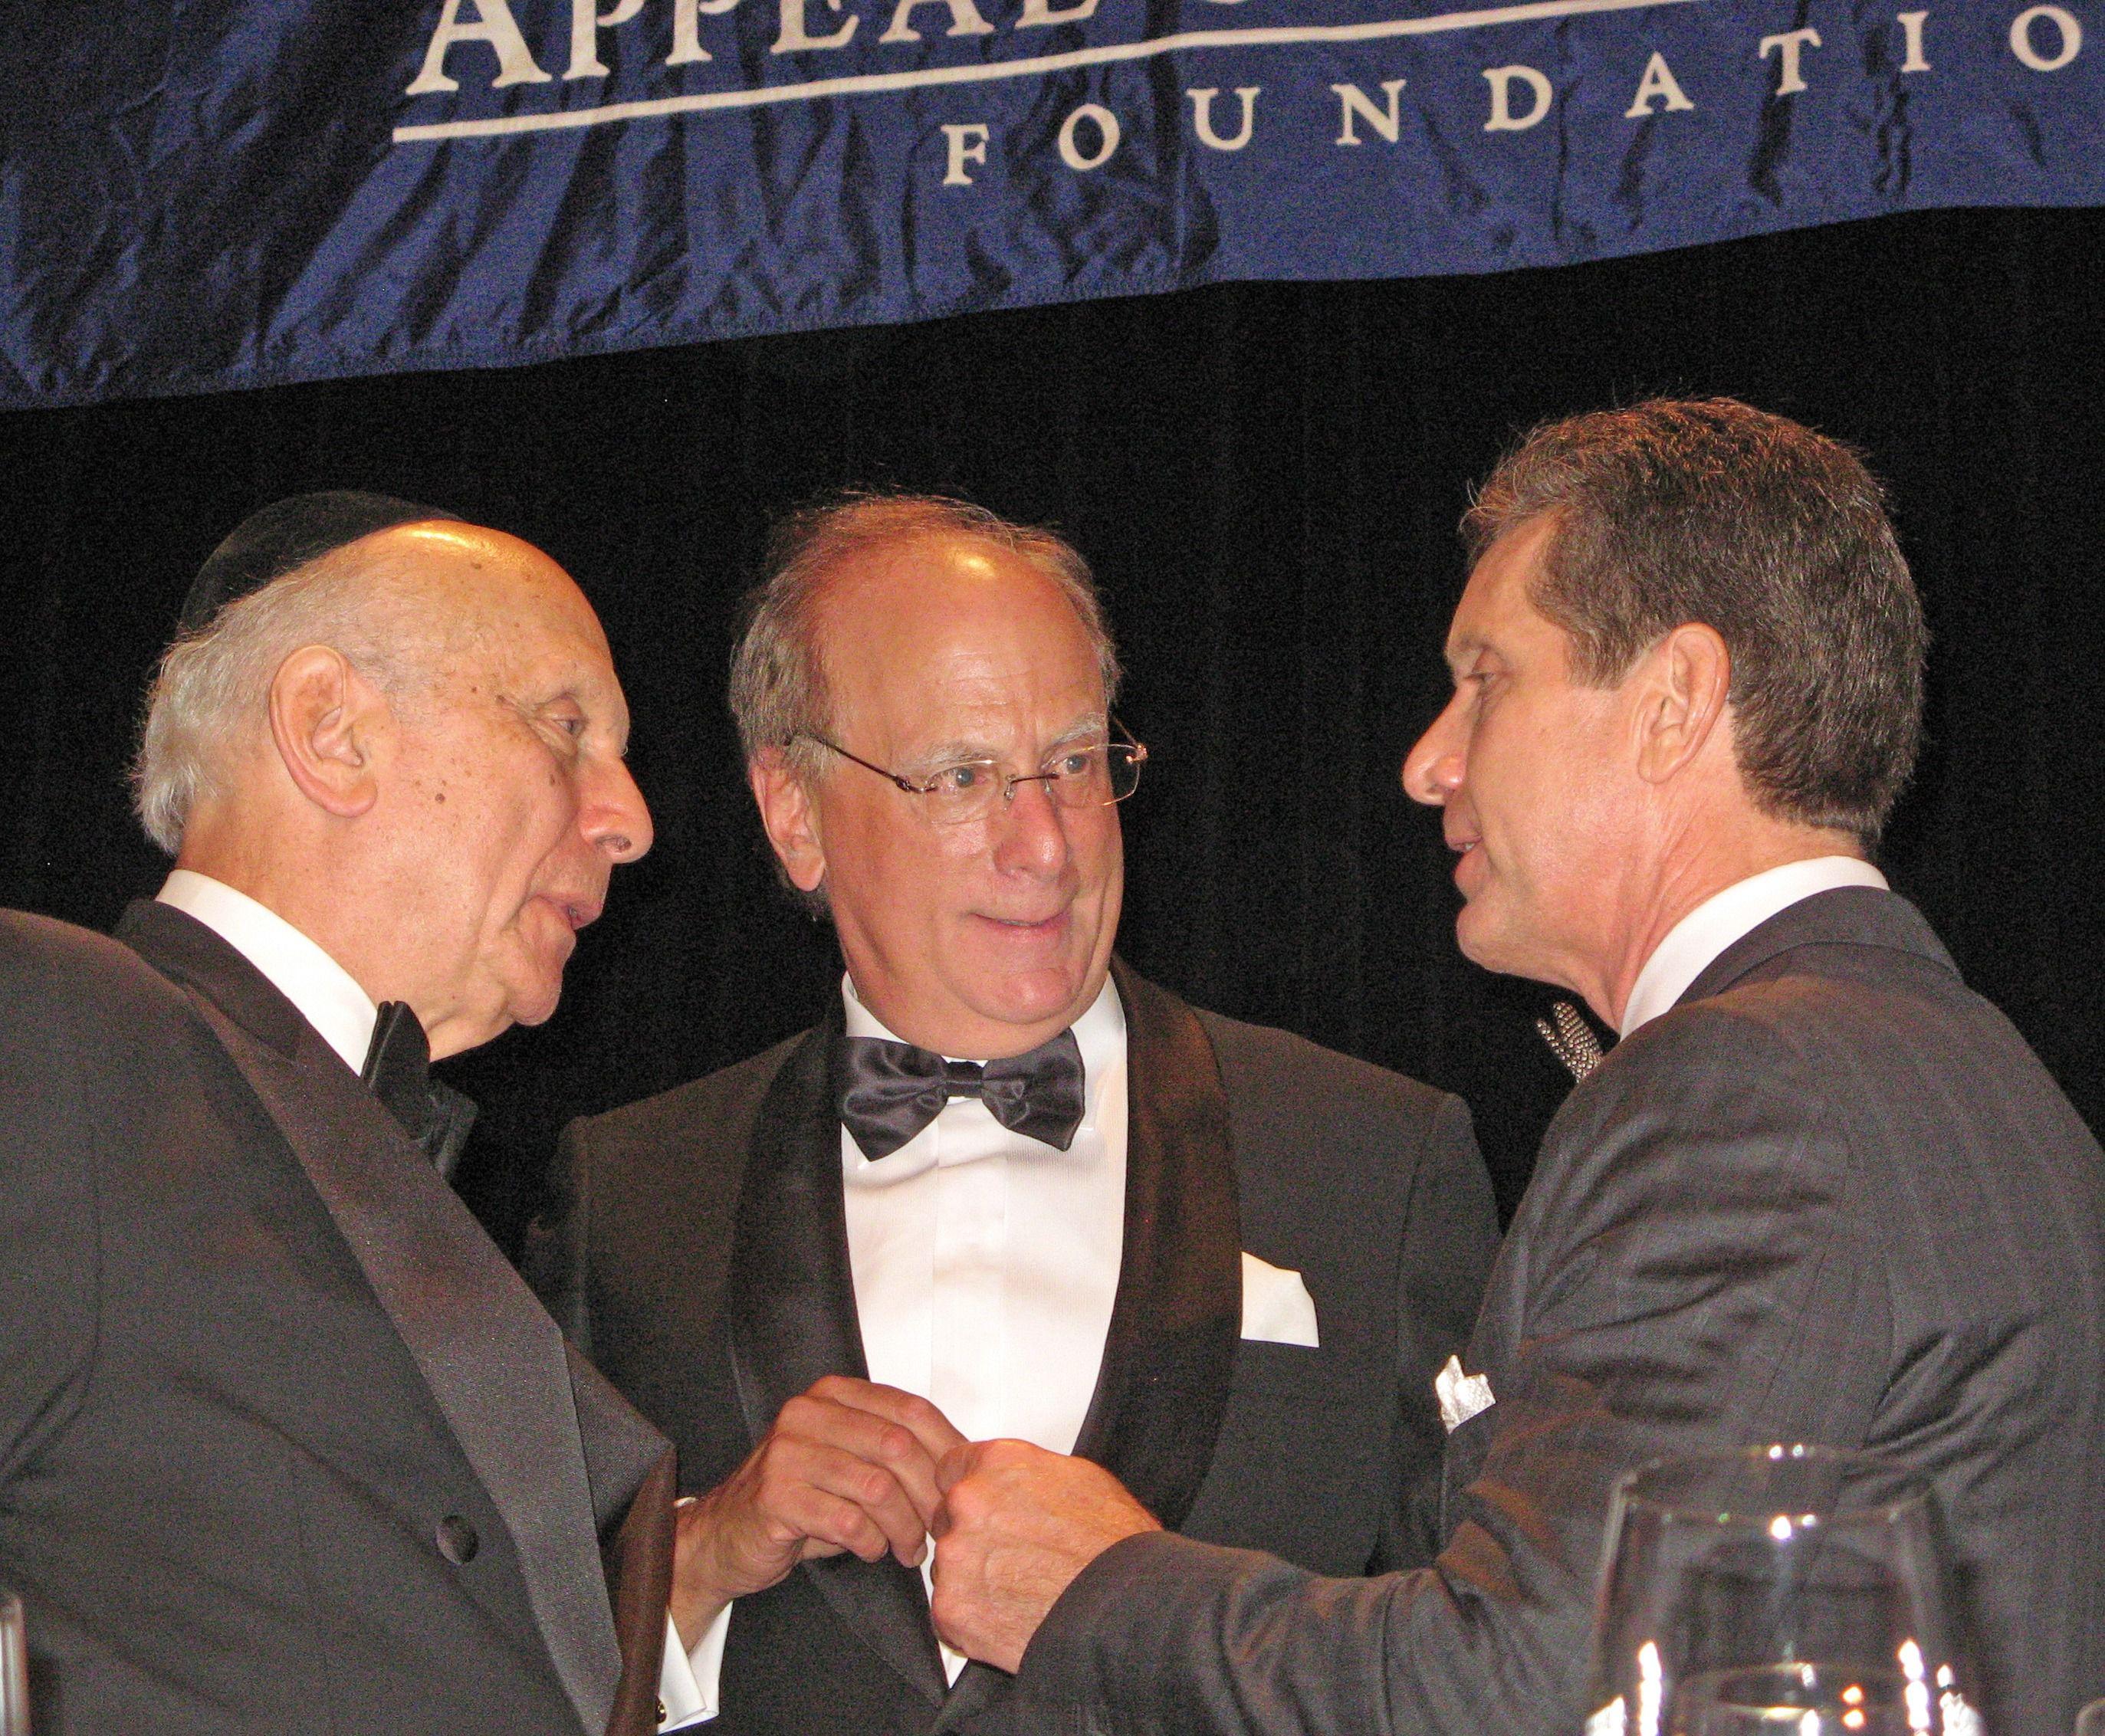 Rabbi Arthur Schneier, Laurence Fink and Alex Gorsky.